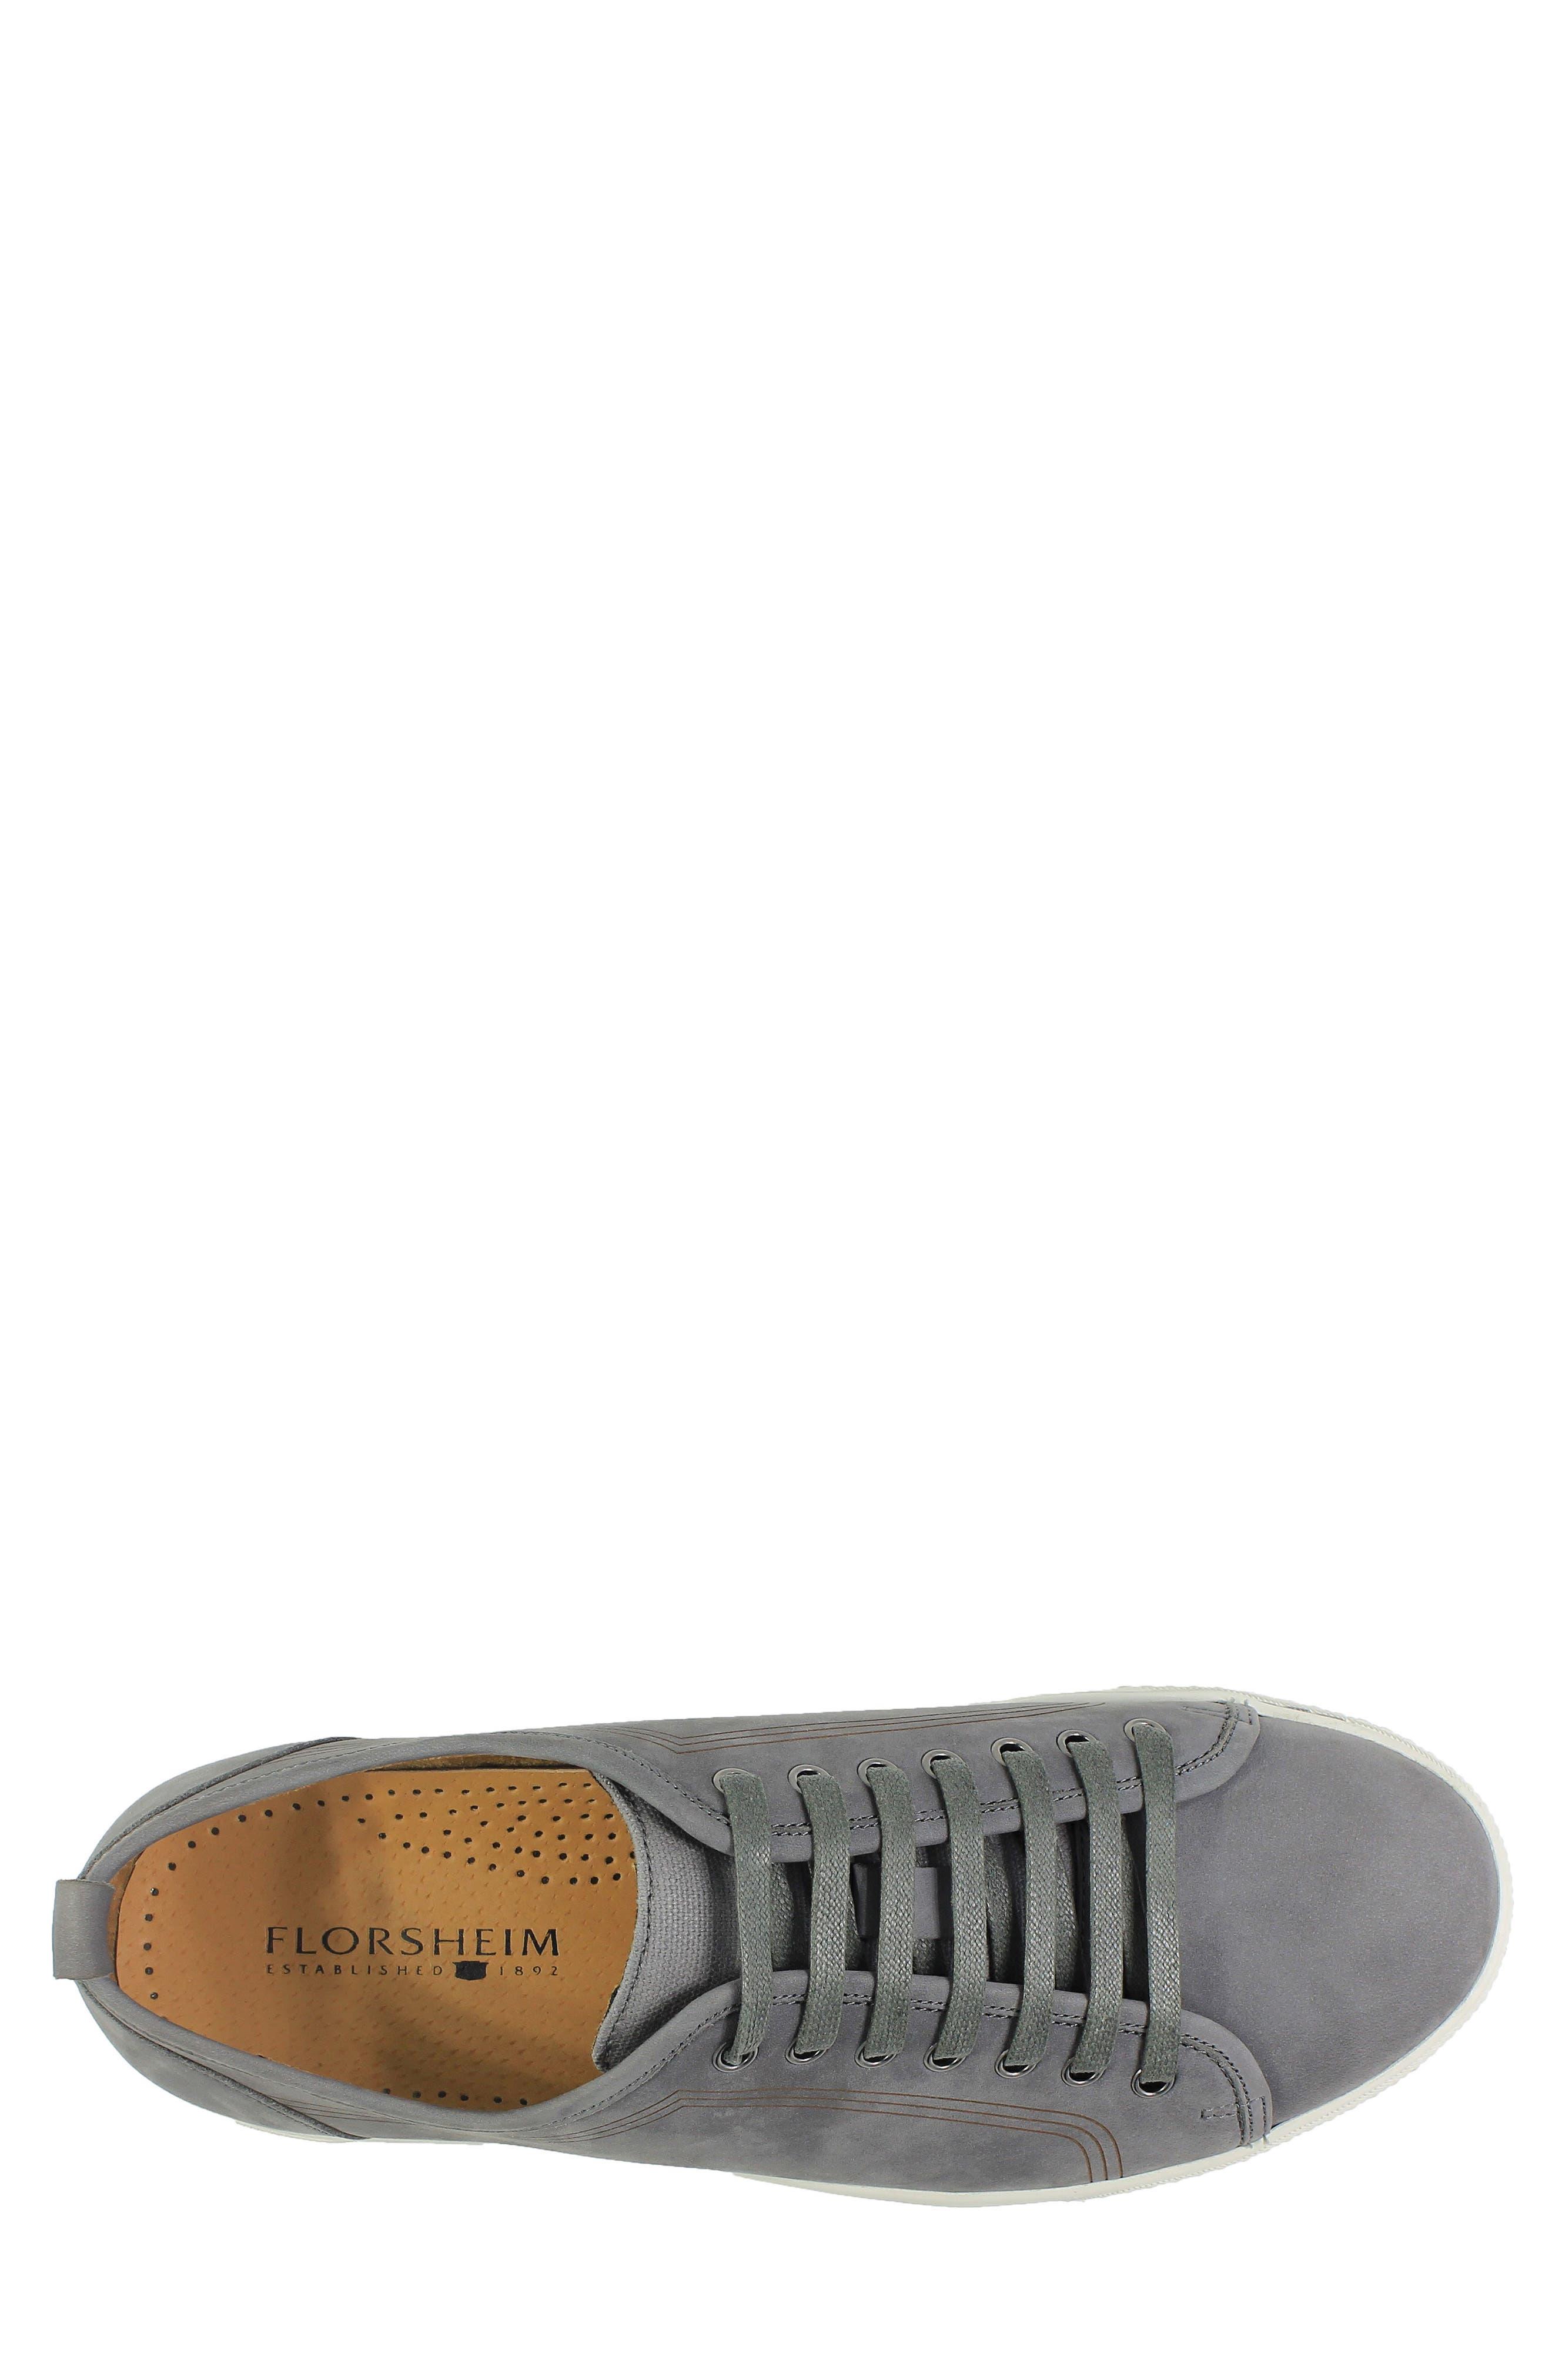 Forward Lo Sneaker,                             Alternate thumbnail 24, color,